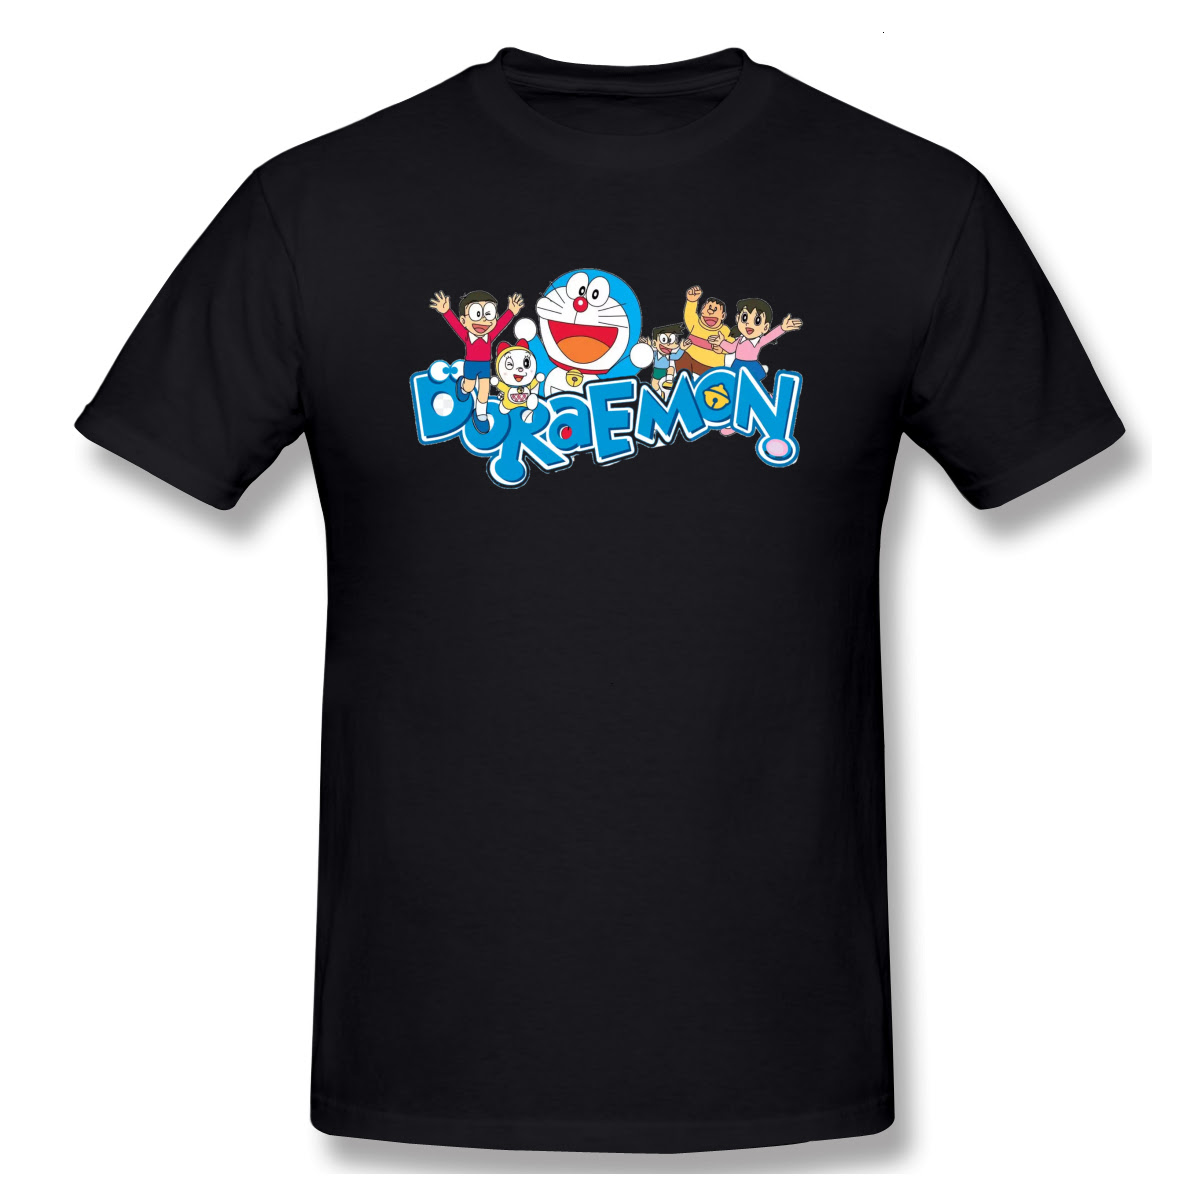 Men T-Shirts Summer Men's Basic Short Sleeve T-Shirt Casual Cotton Doraemon Family printing t shirt men tee shirt 4XL 5XL